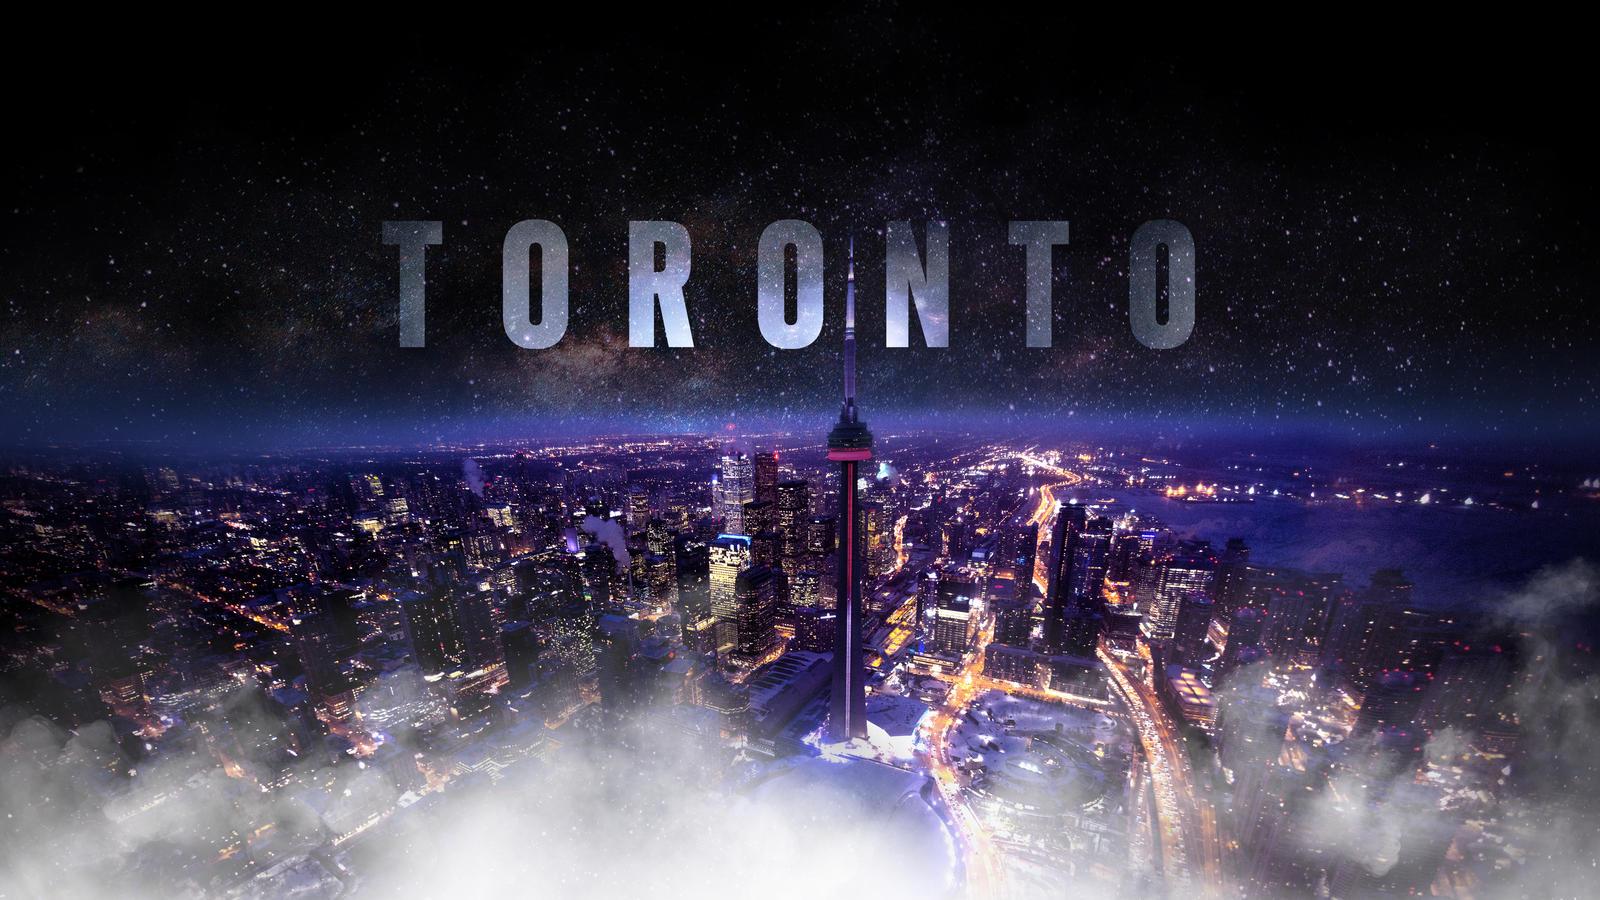 All-Star Toronto